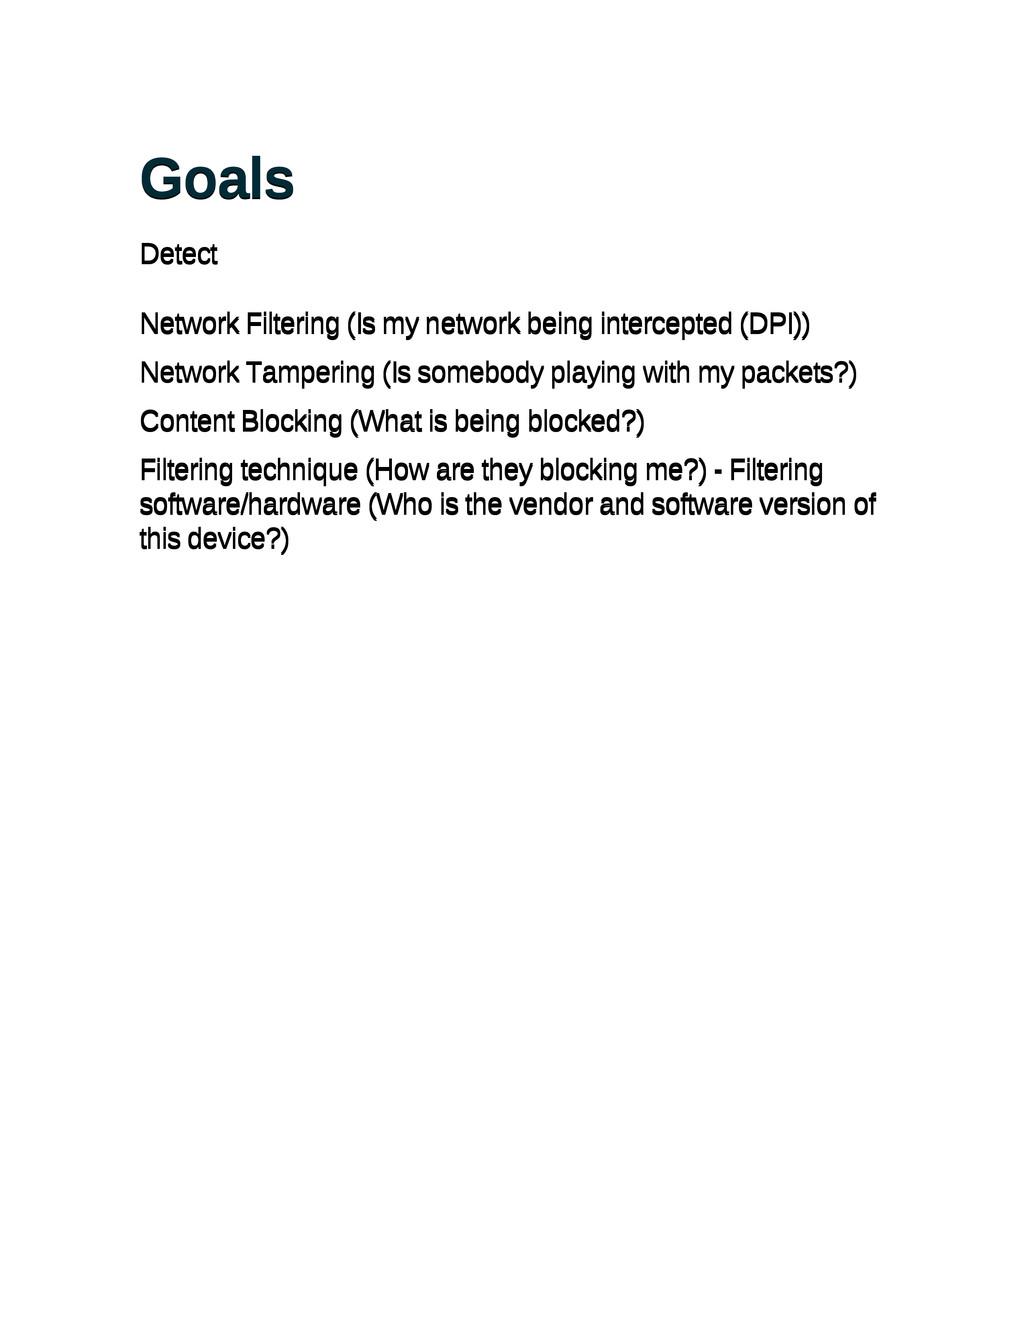 Goals Goals Detect Detect Network Filtering (Is...